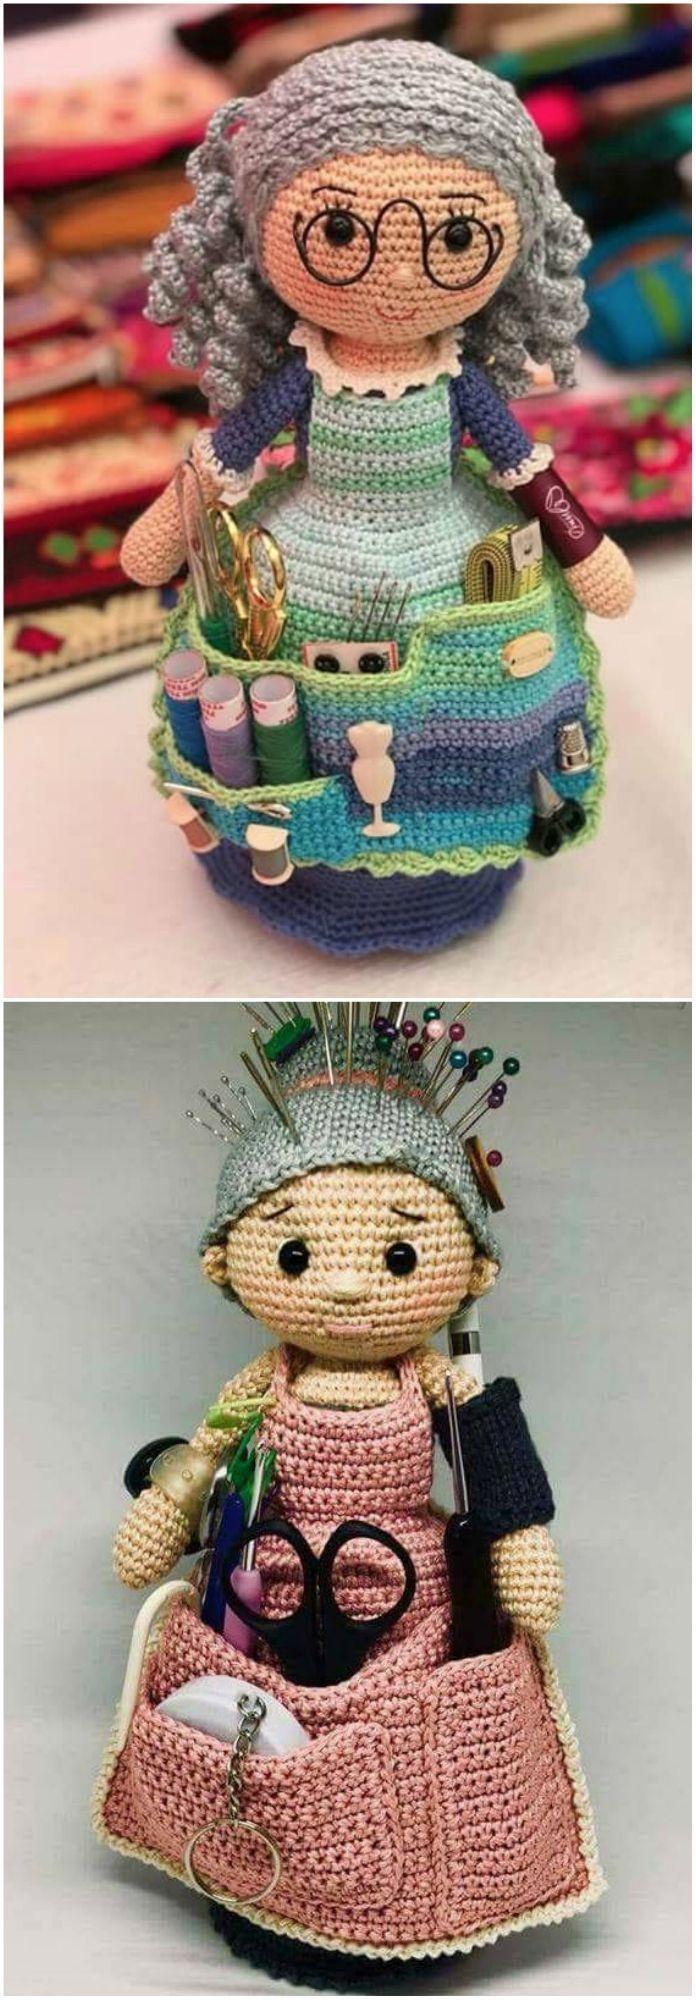 Crafter Oma Häkeln Puppe Kostenlose Muster